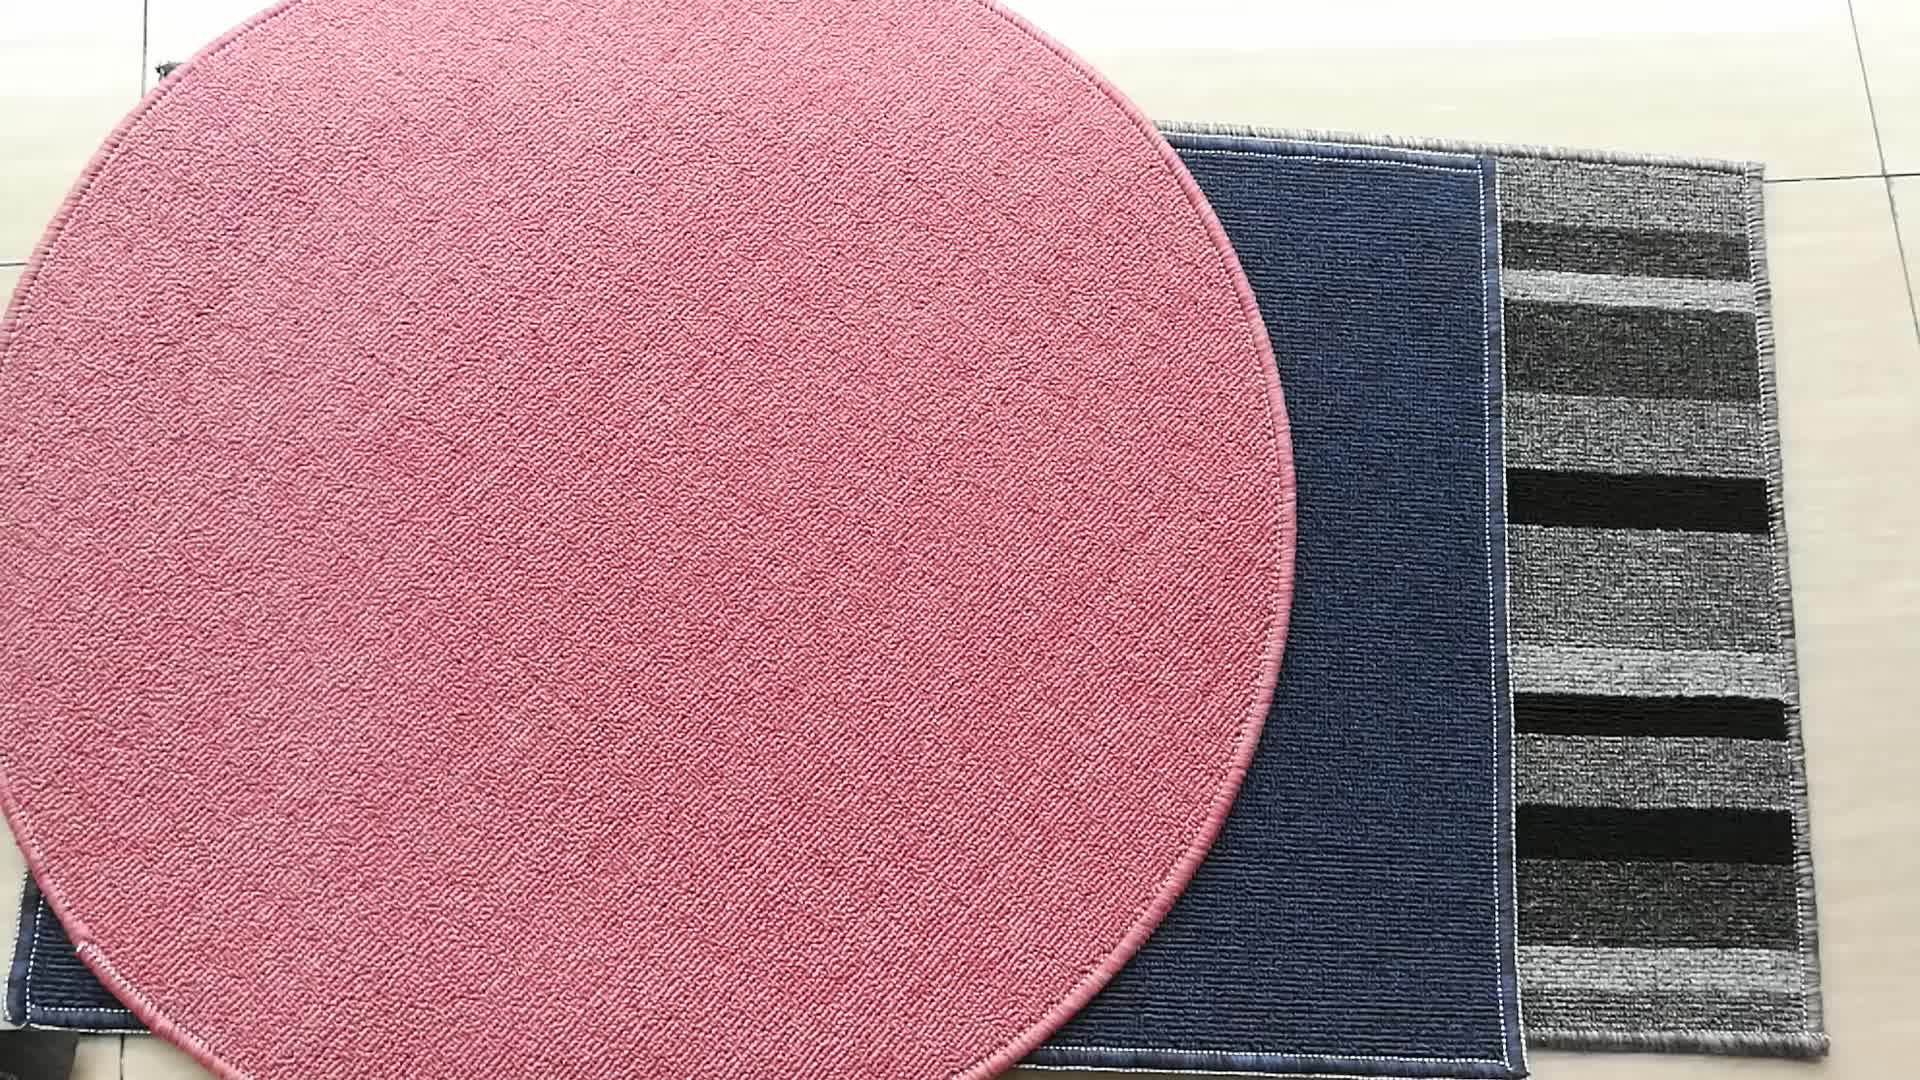 Vuelos baratos de China shaggy cut pila pp zapato impermeable limpieza puerta mat